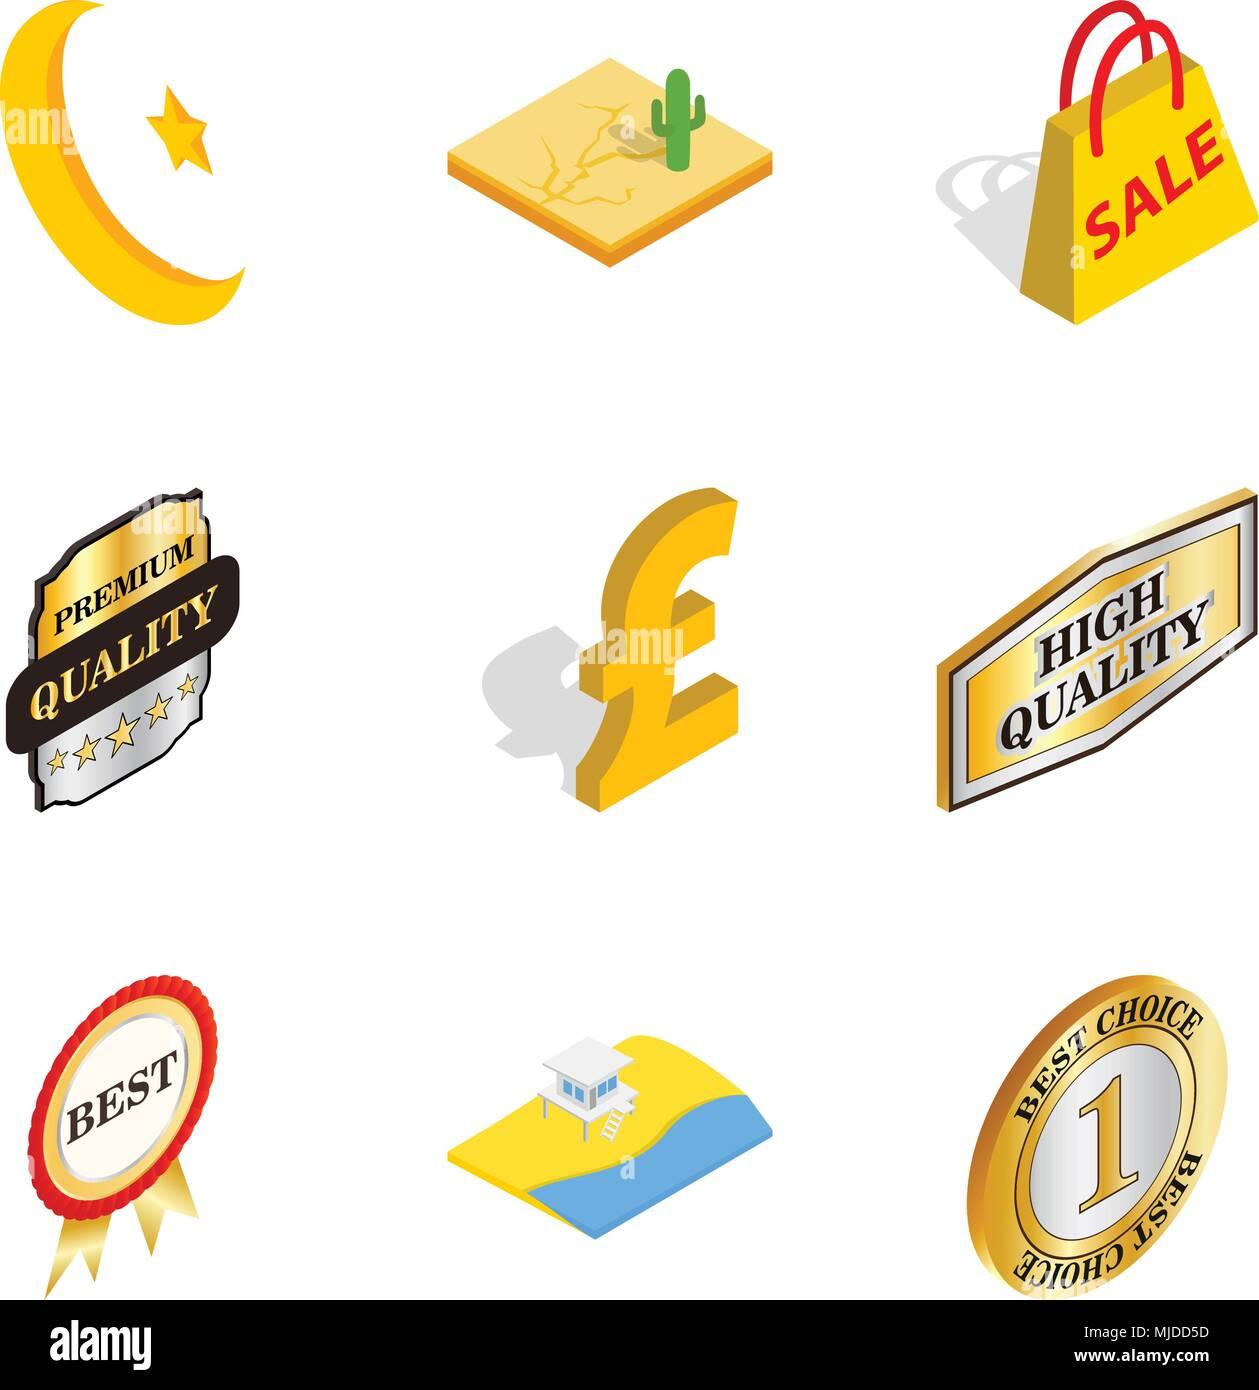 Free world icons set, isometric style Stock Vector